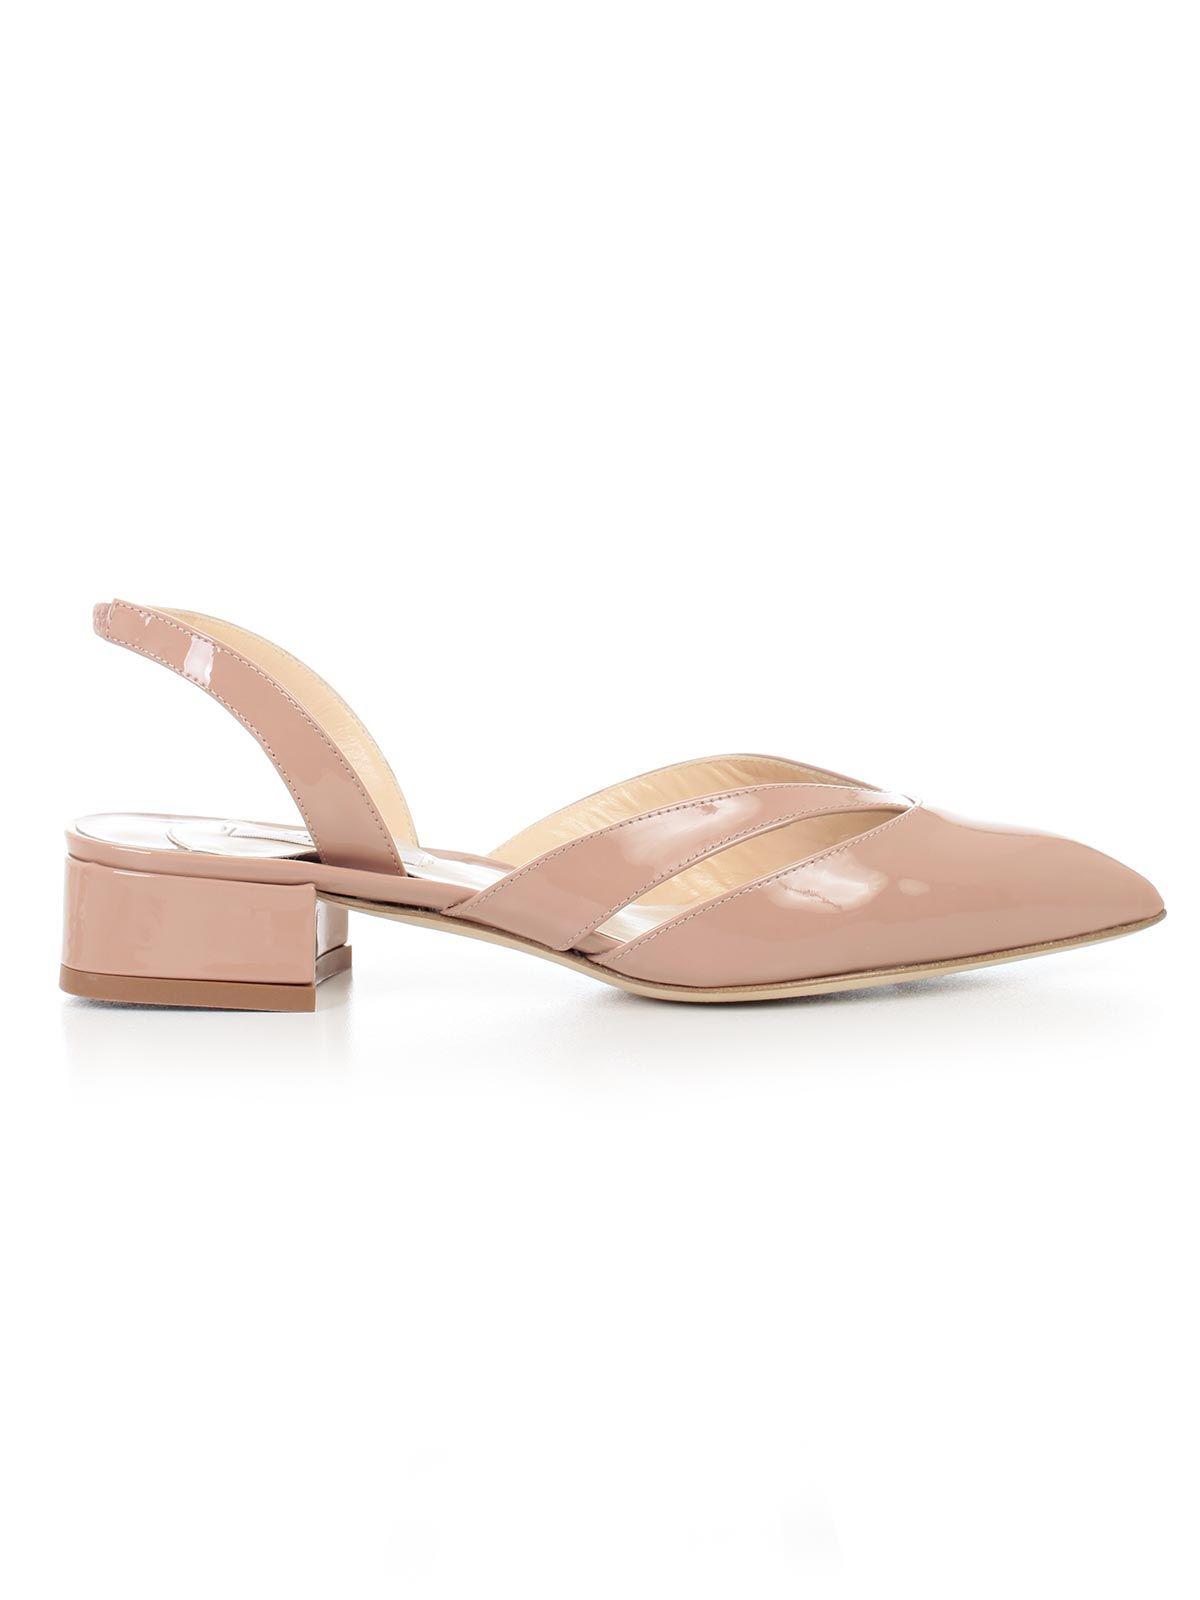 Olgana Sandals